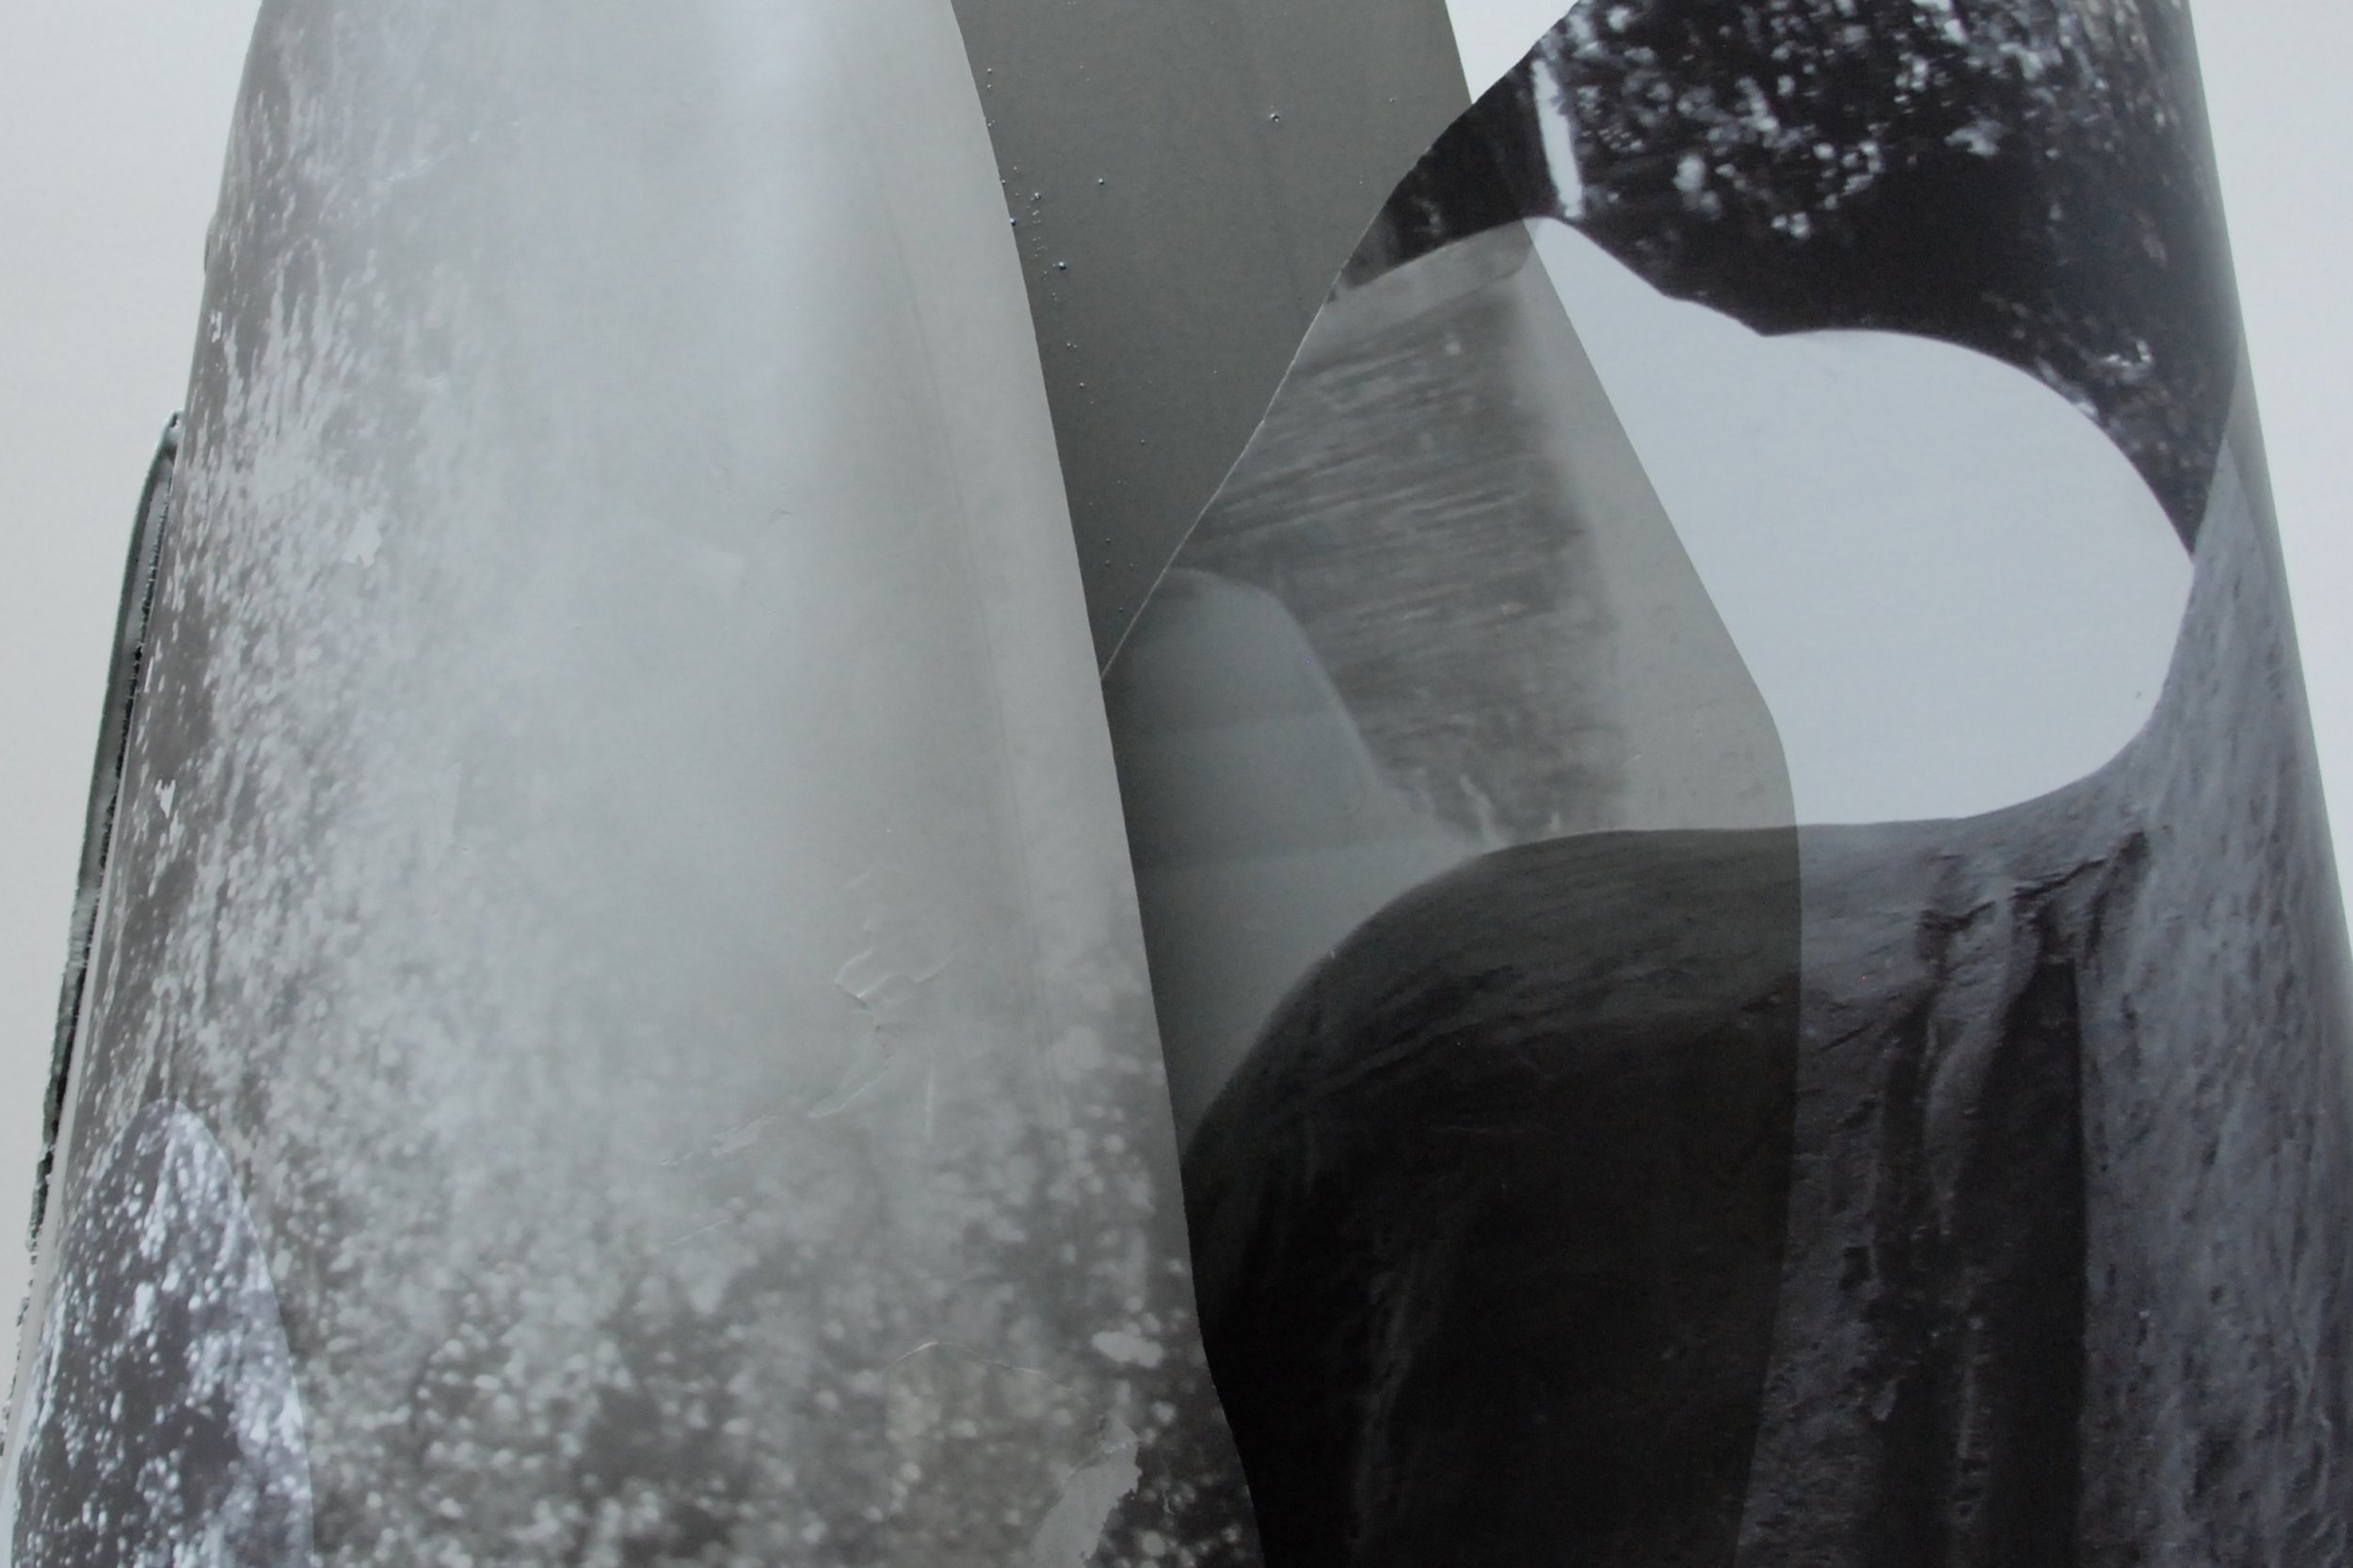 Memory of Forms - Hengesbach Gallery Berlin, 2010